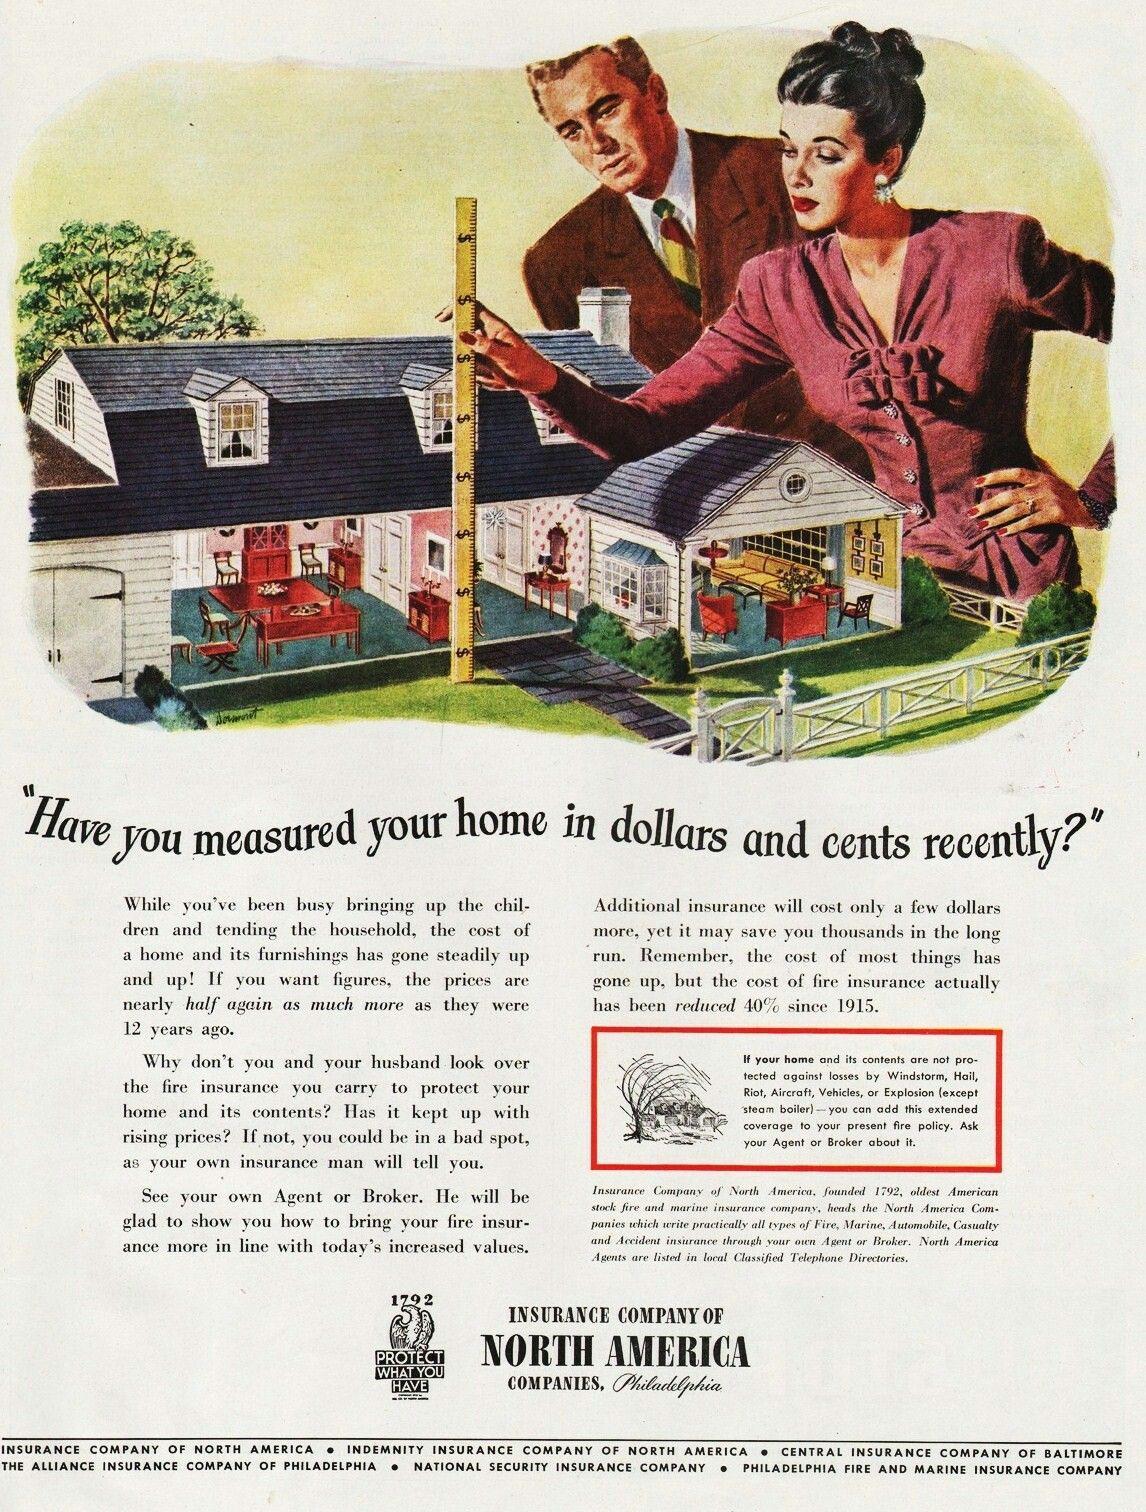 Insurance Company Of North America 1945 Insurance Ads Insurance